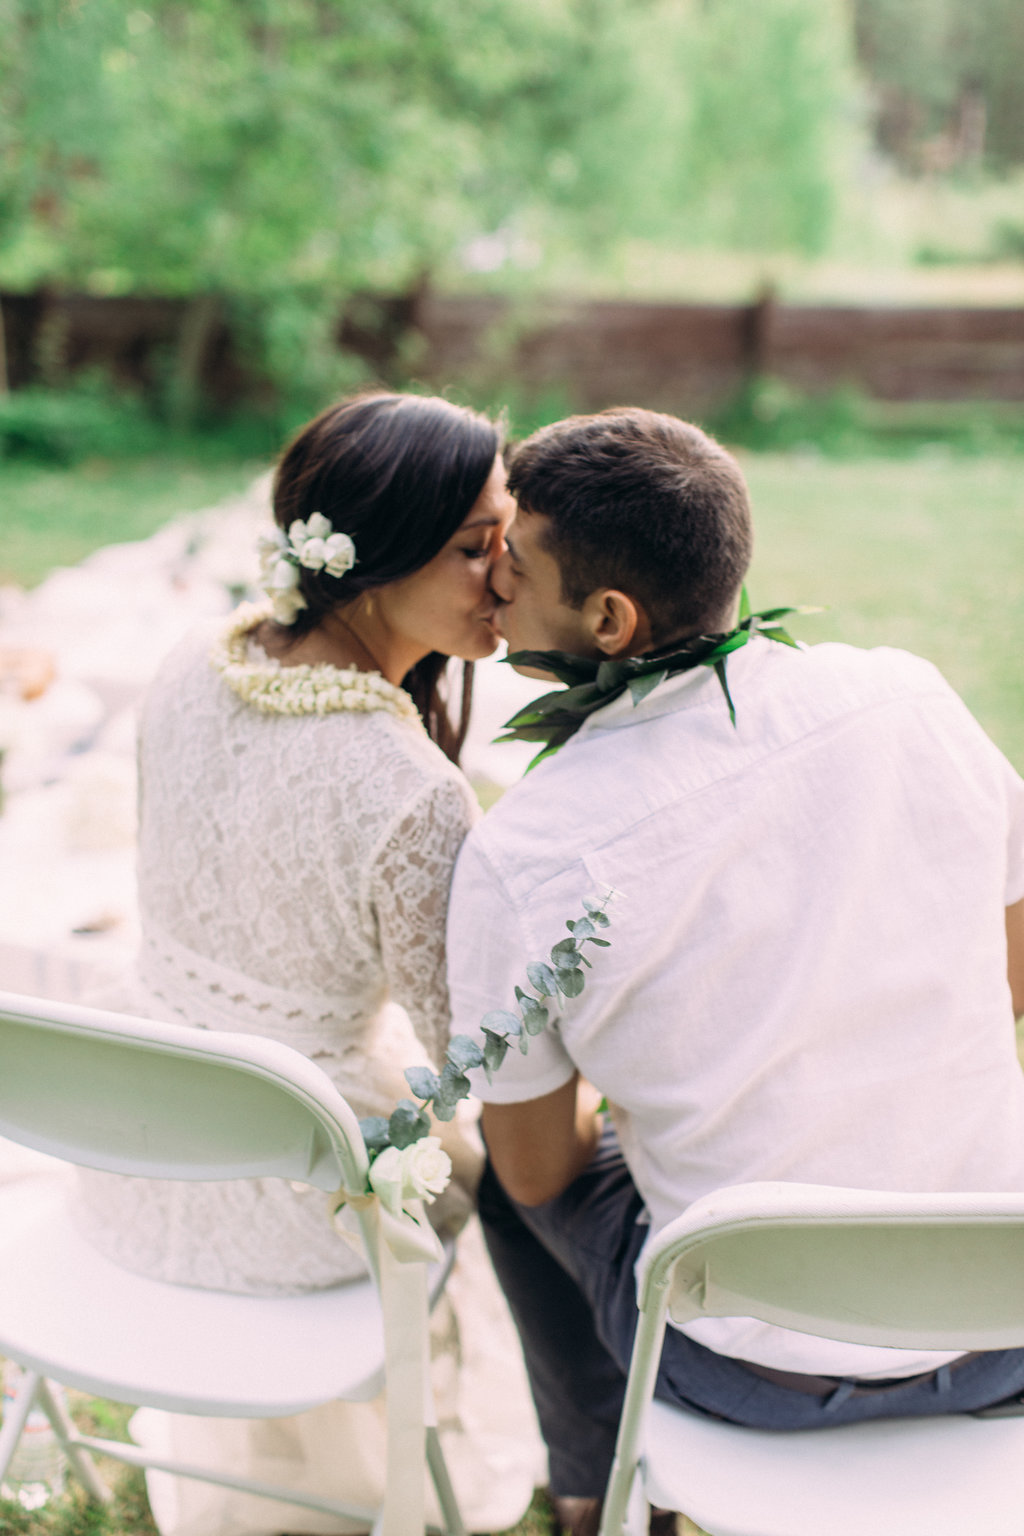 000045_gallardo_wedding0531.jpg